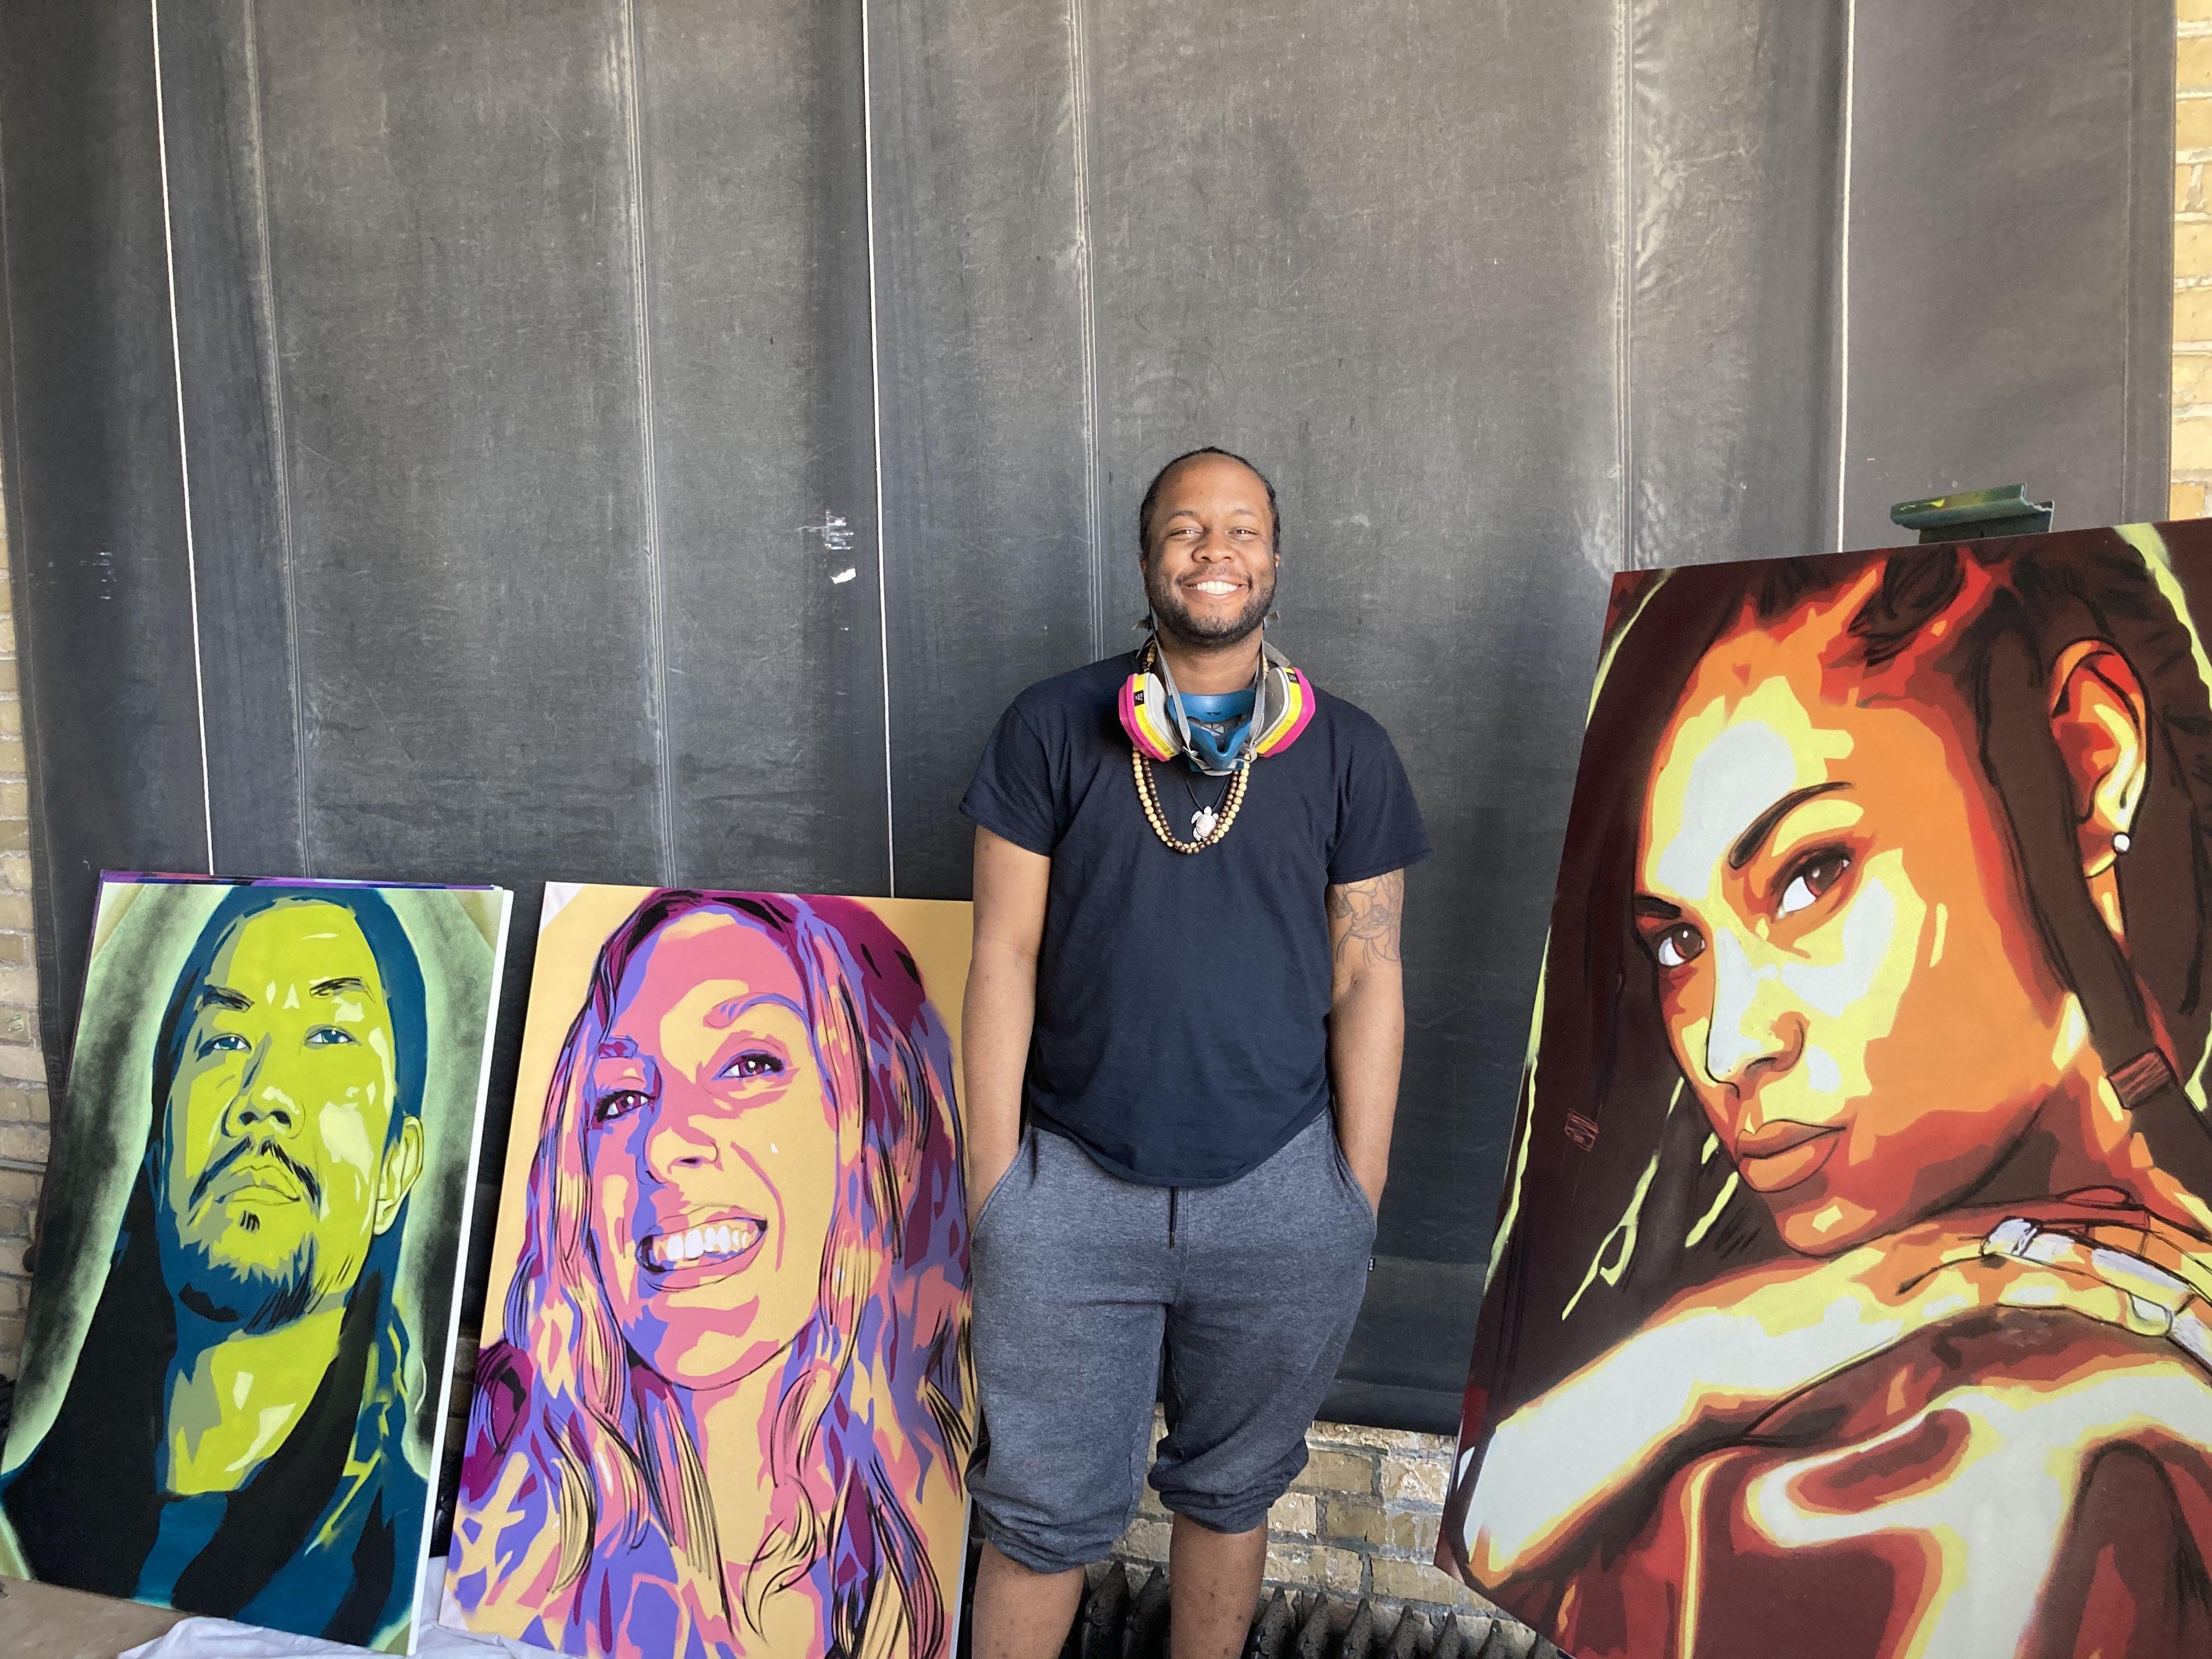 Caption: Minnesota artist Reggie LeFlore poses among his paintings. , Credit: Sheila Regan